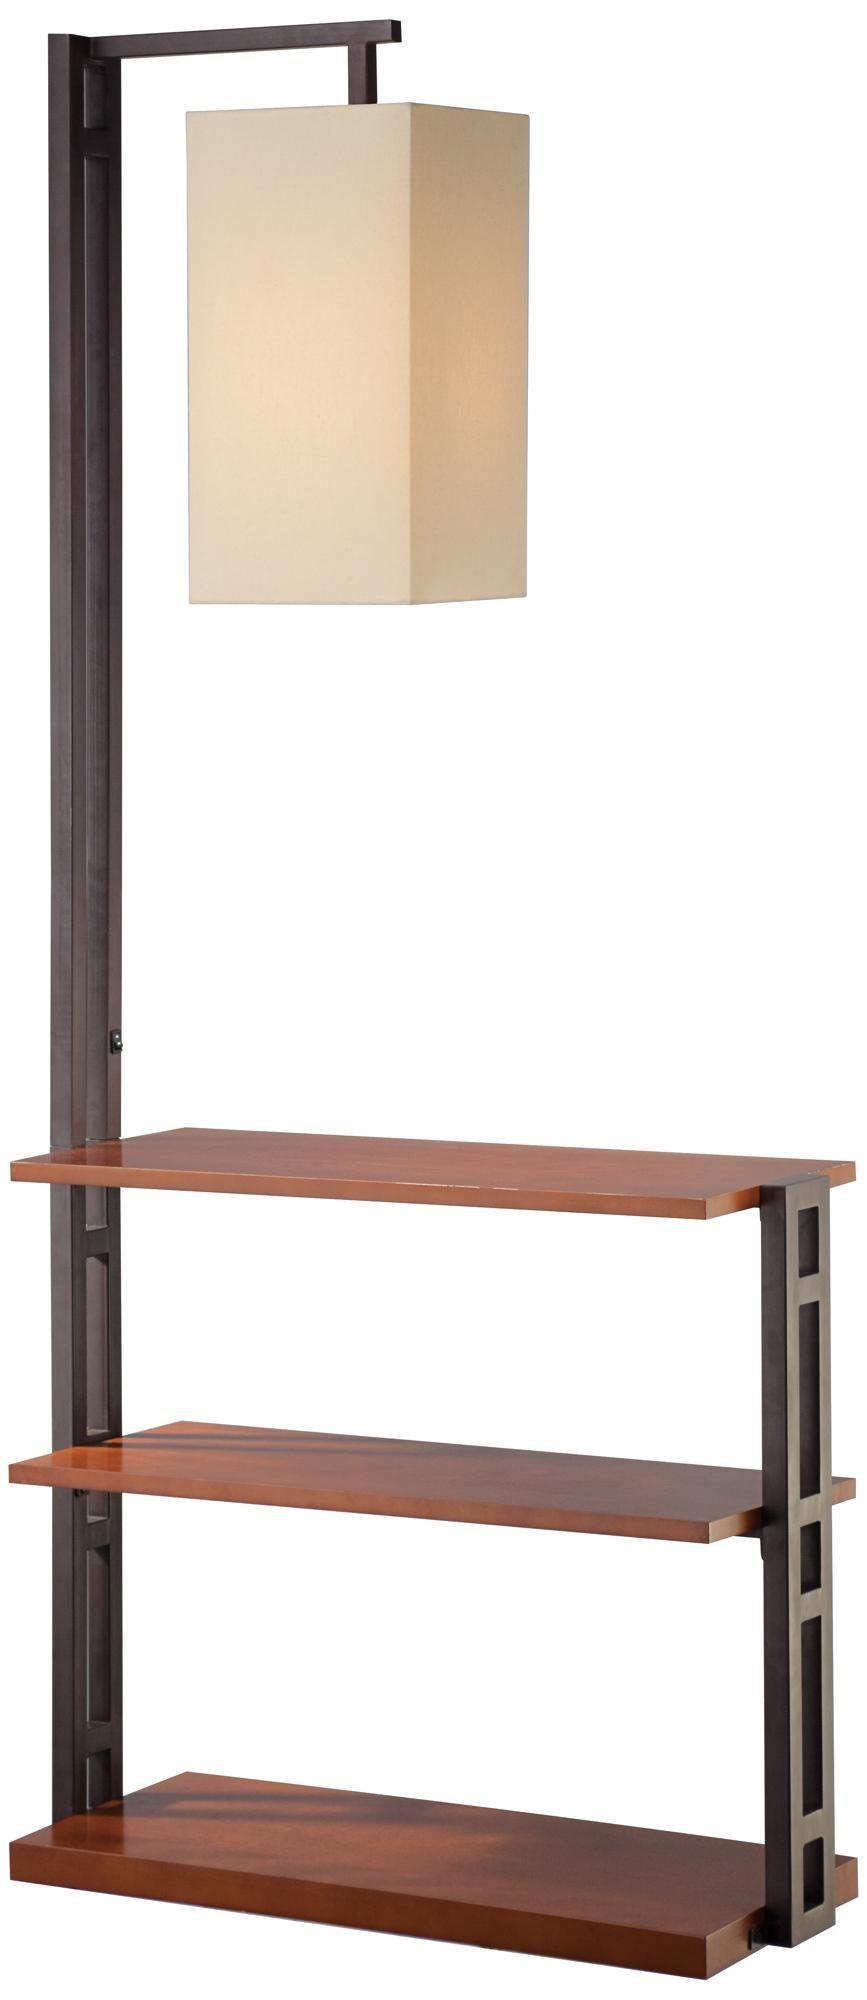 triple shelf floor lamp with beige linen shade 66x30x12 green house 42. Black Bedroom Furniture Sets. Home Design Ideas